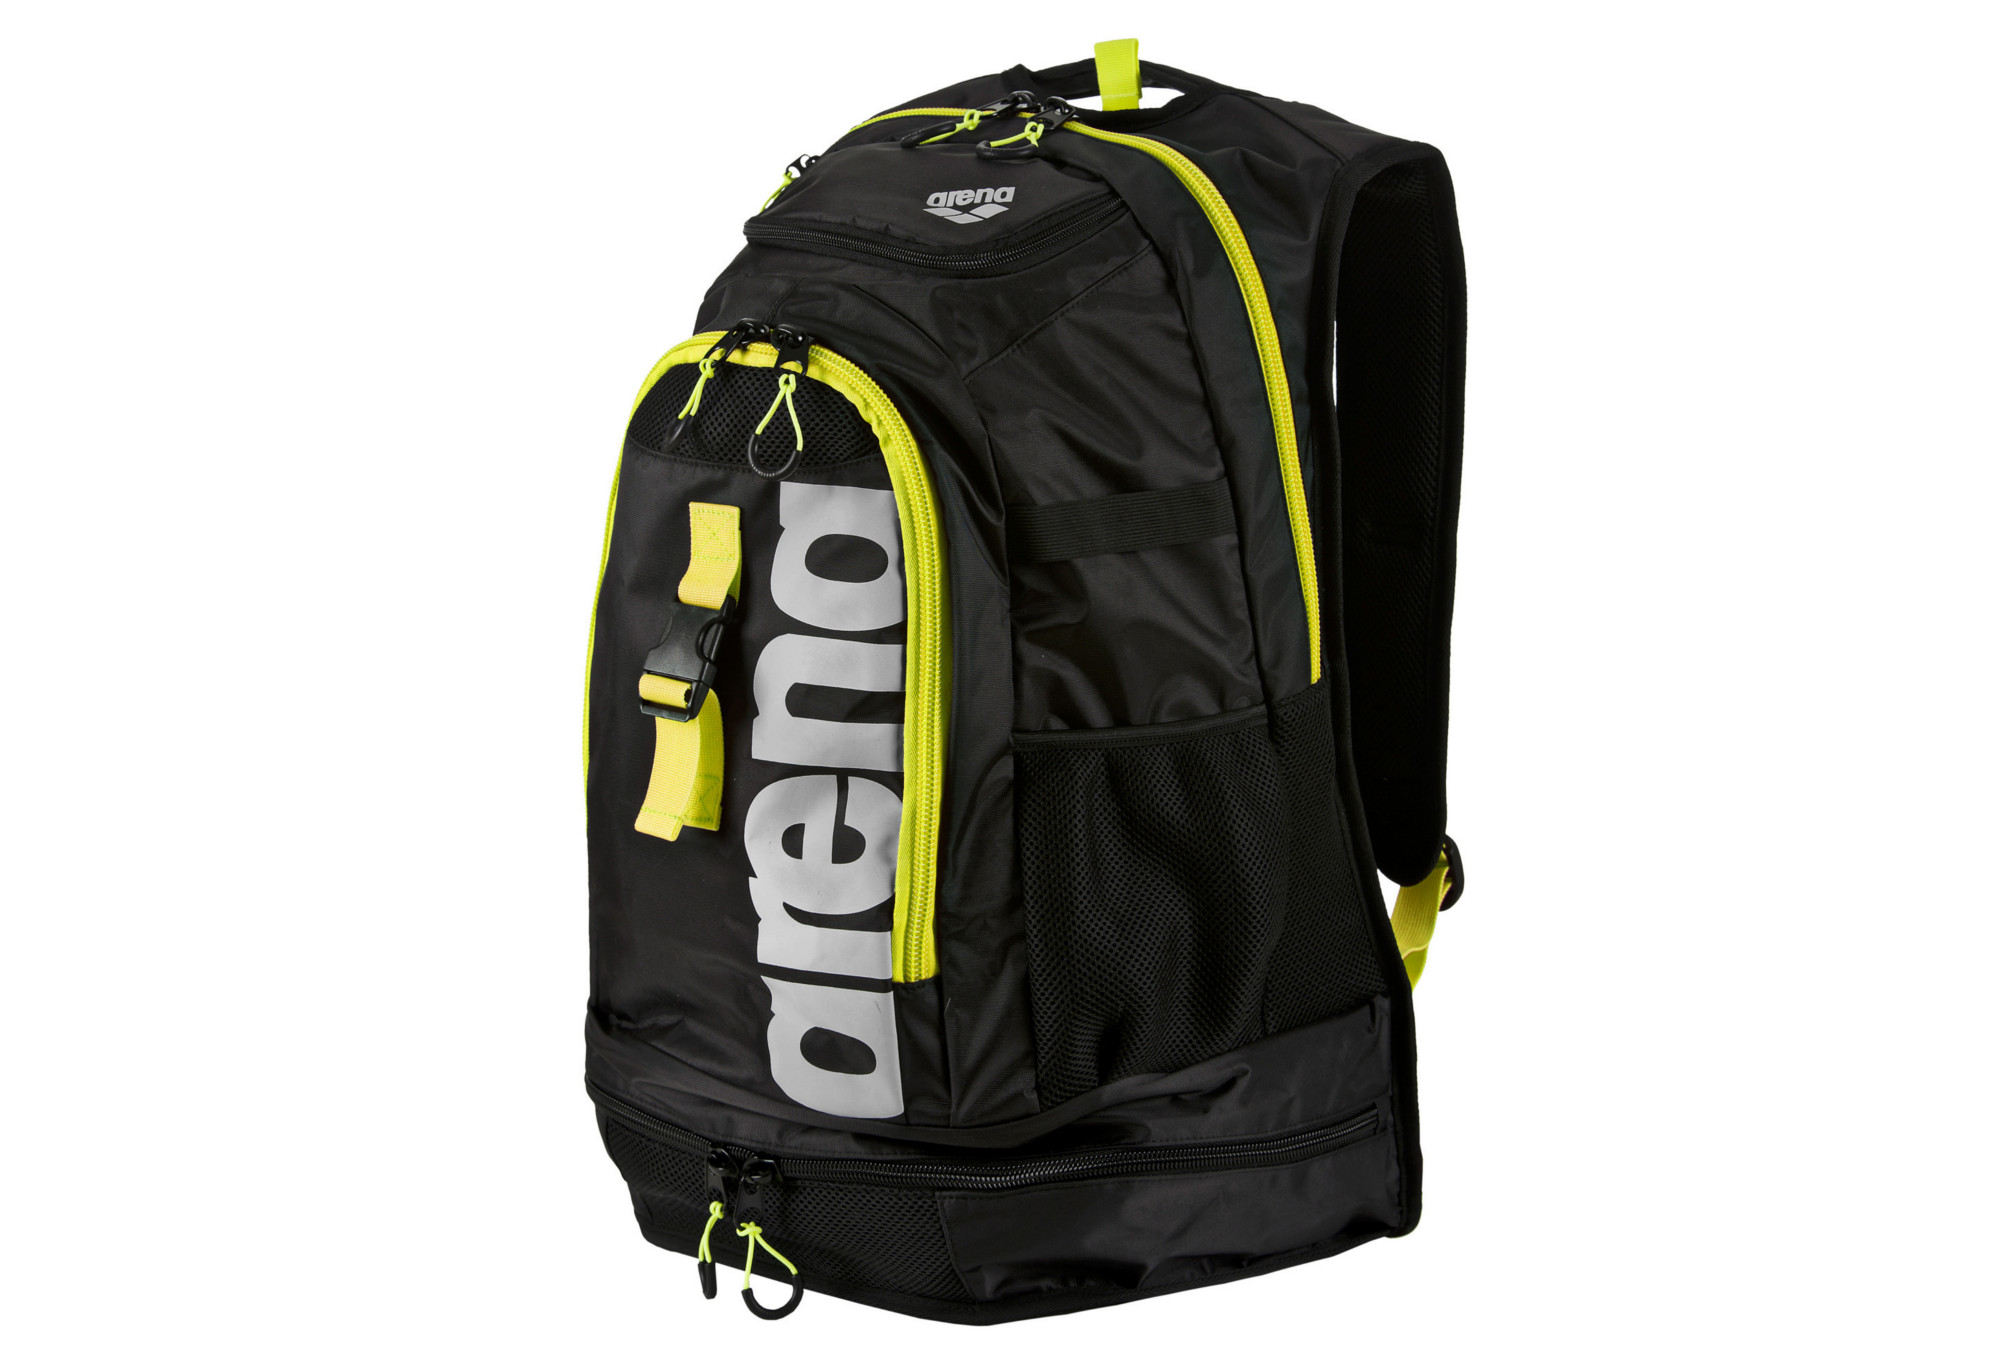 sac de piscine arena fastpack 2 1 noir jaune